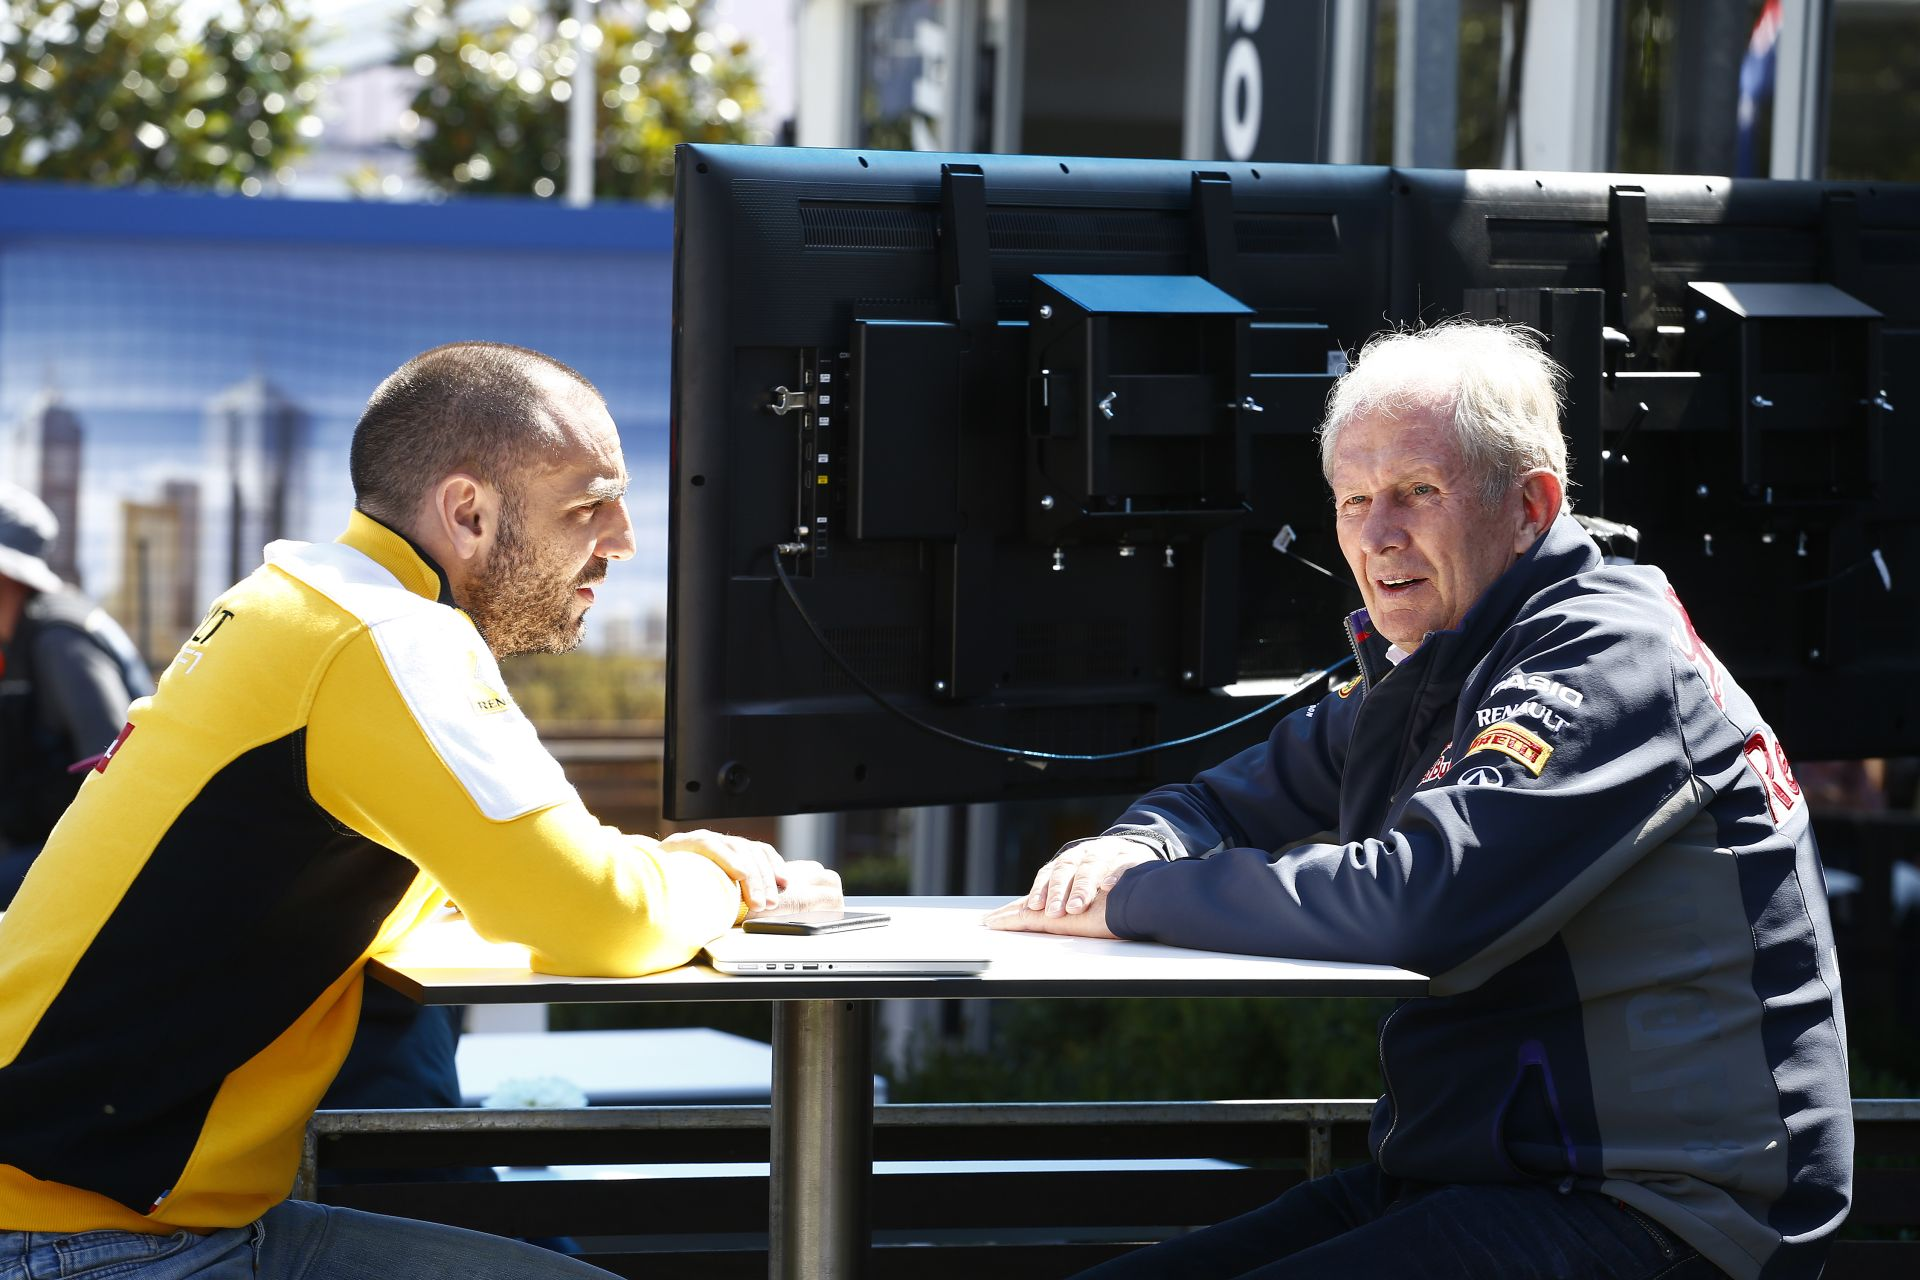 Renault: Nehéz ha olyan partnered van, aki hazudik